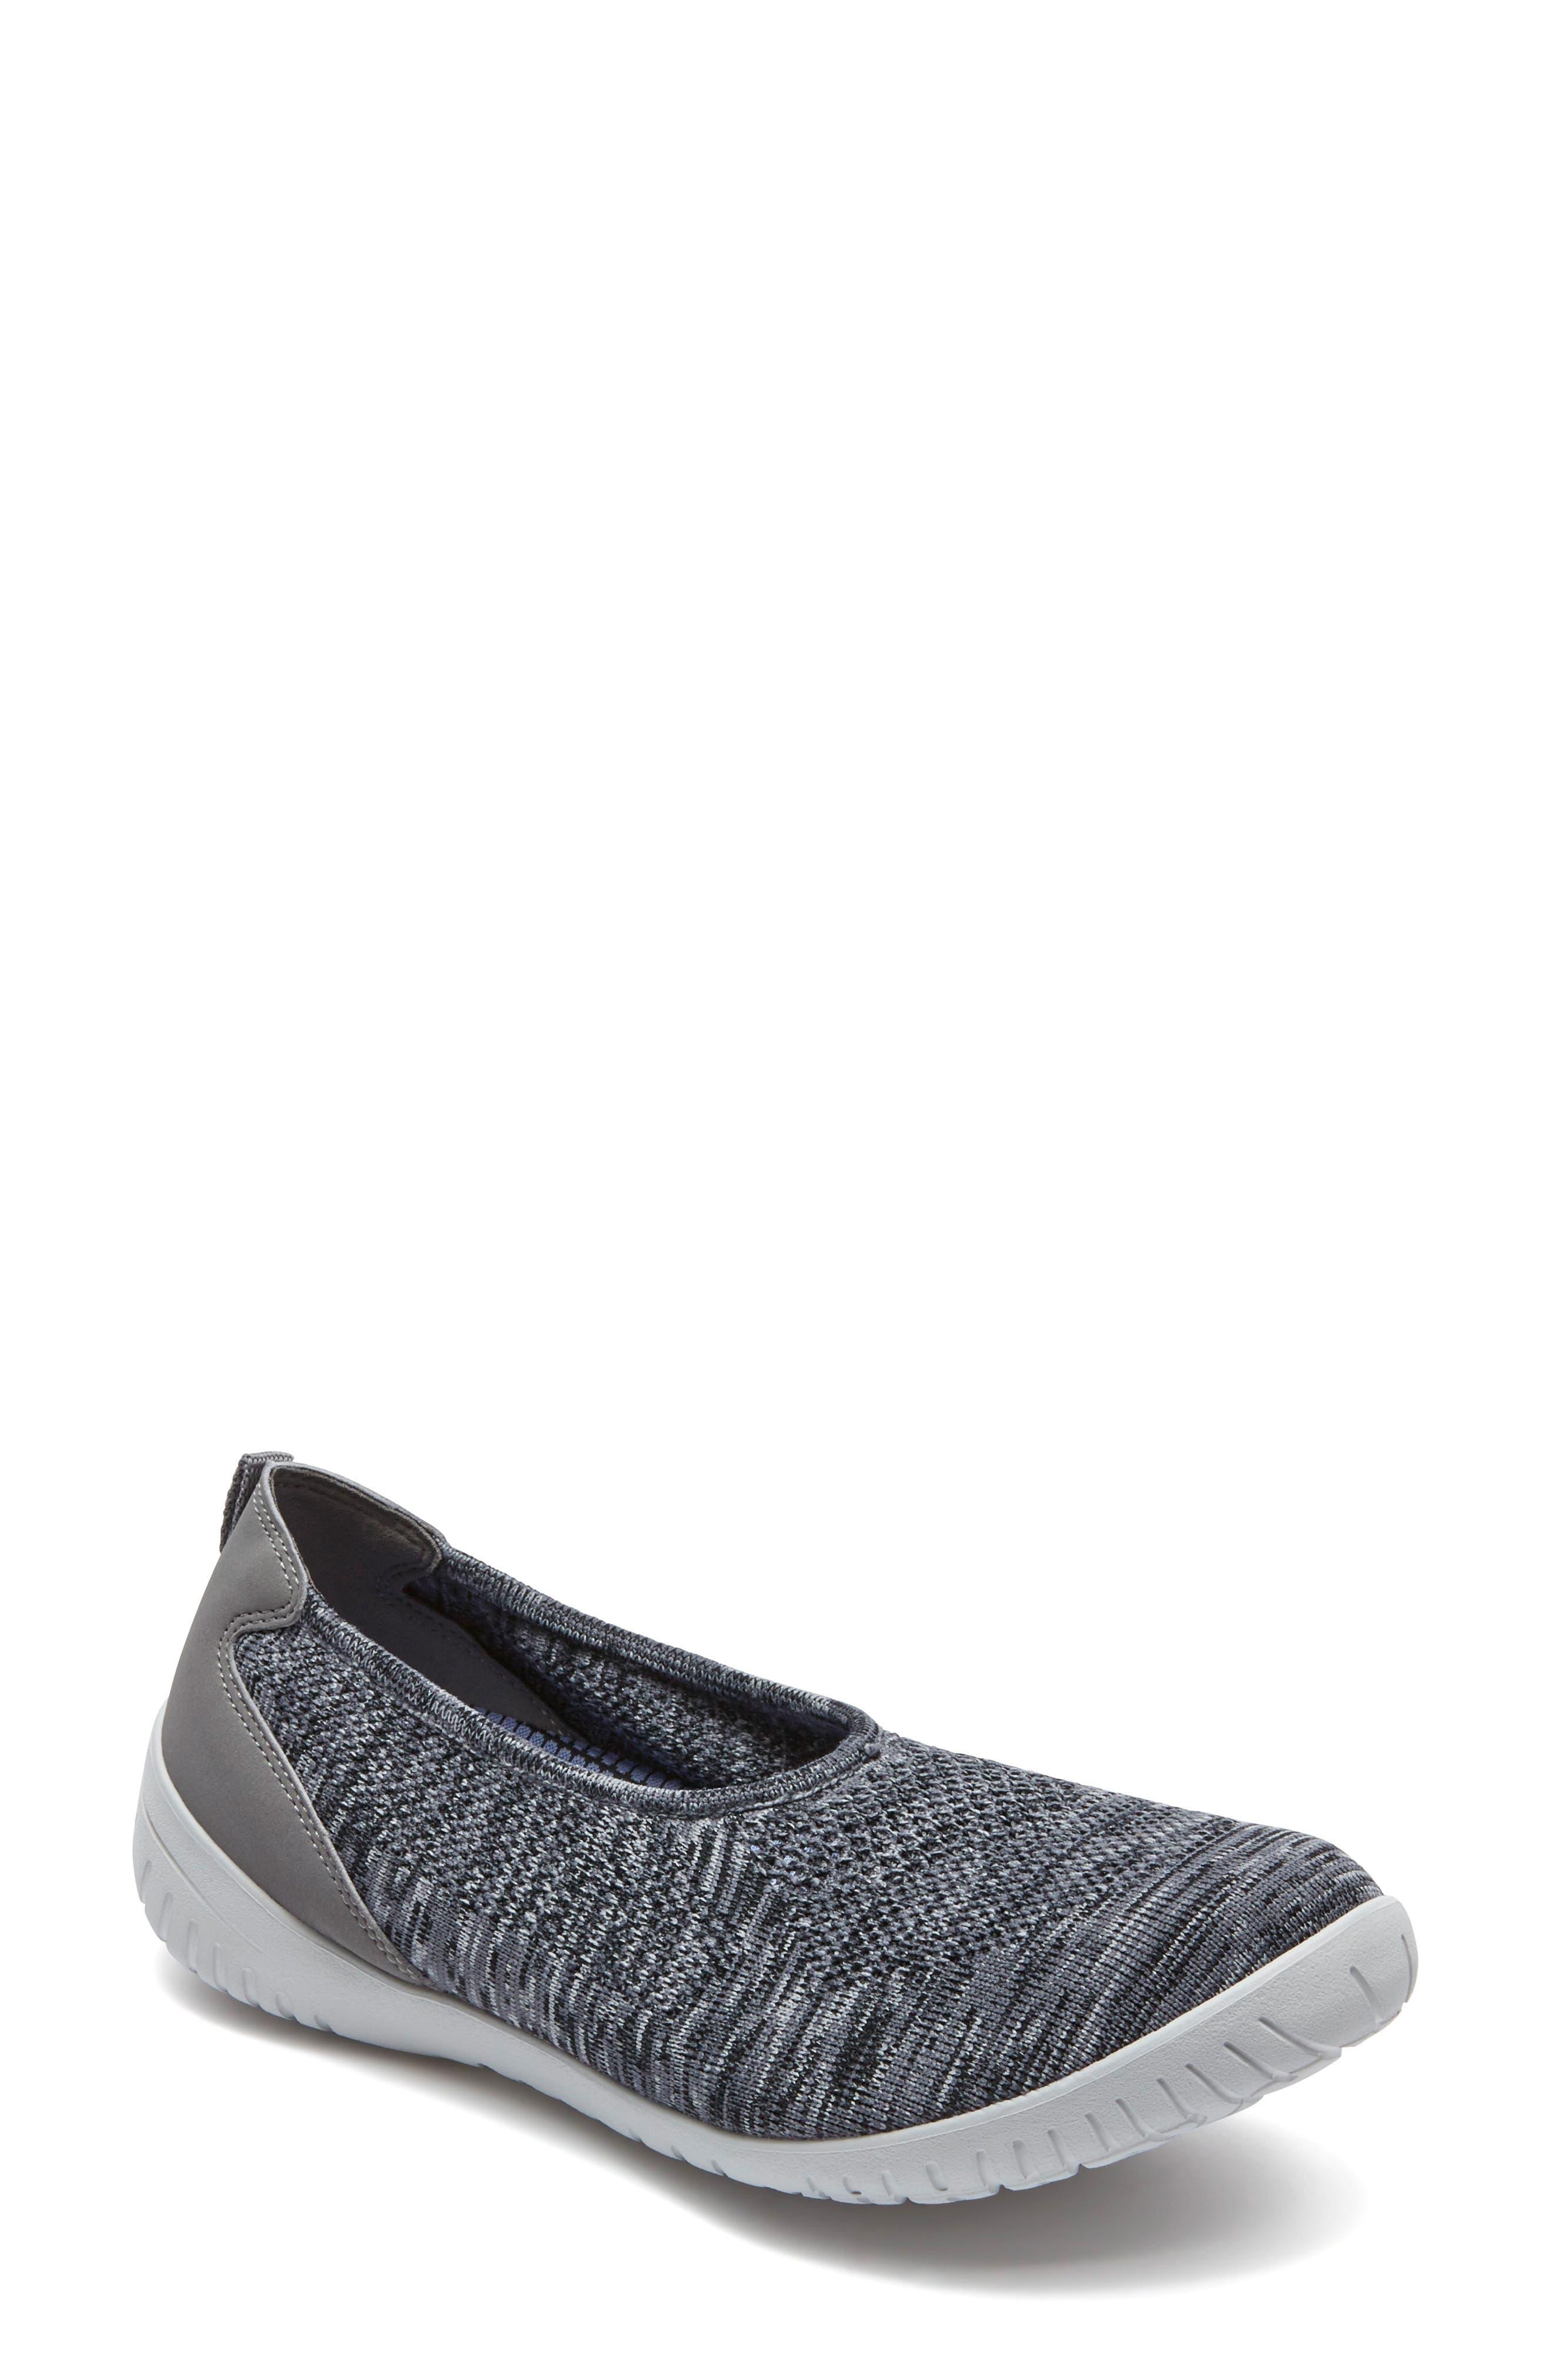 Raelyn Knit Ballet Sneaker,                         Main,                         color, Dark Grey Heather Fabric